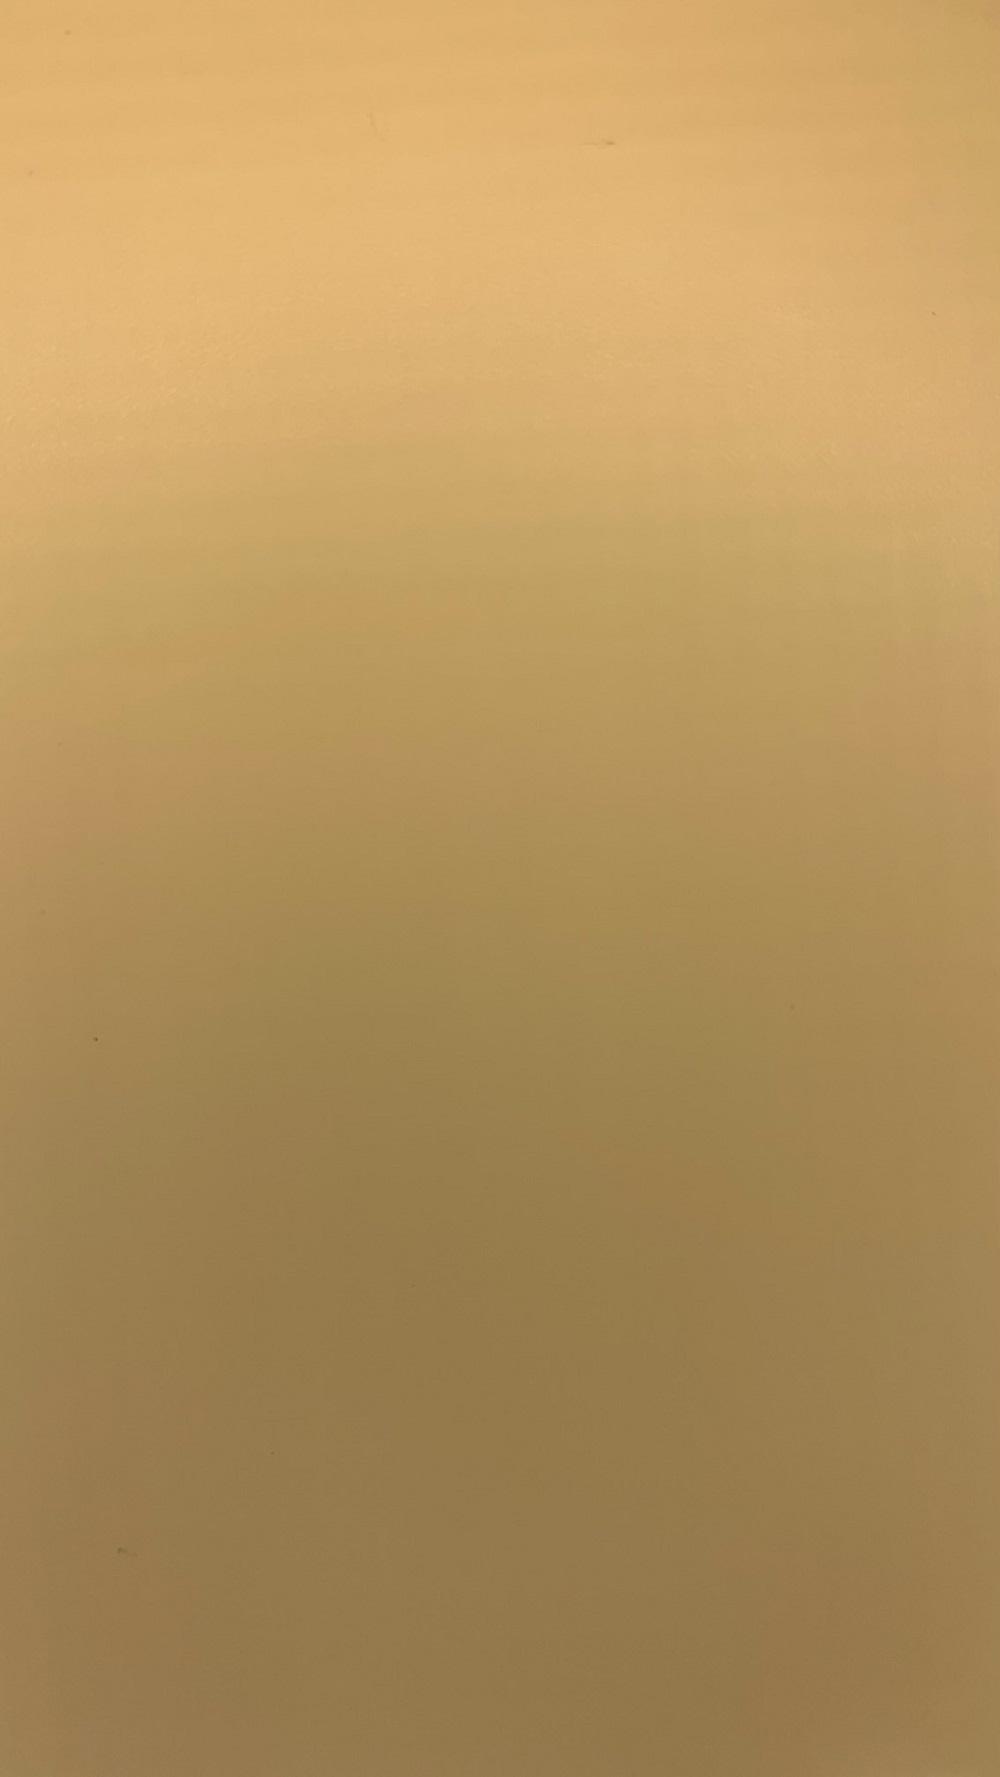 Lona Vinilona Df Fosca Bege S-372 1,45mt X 1,0mt